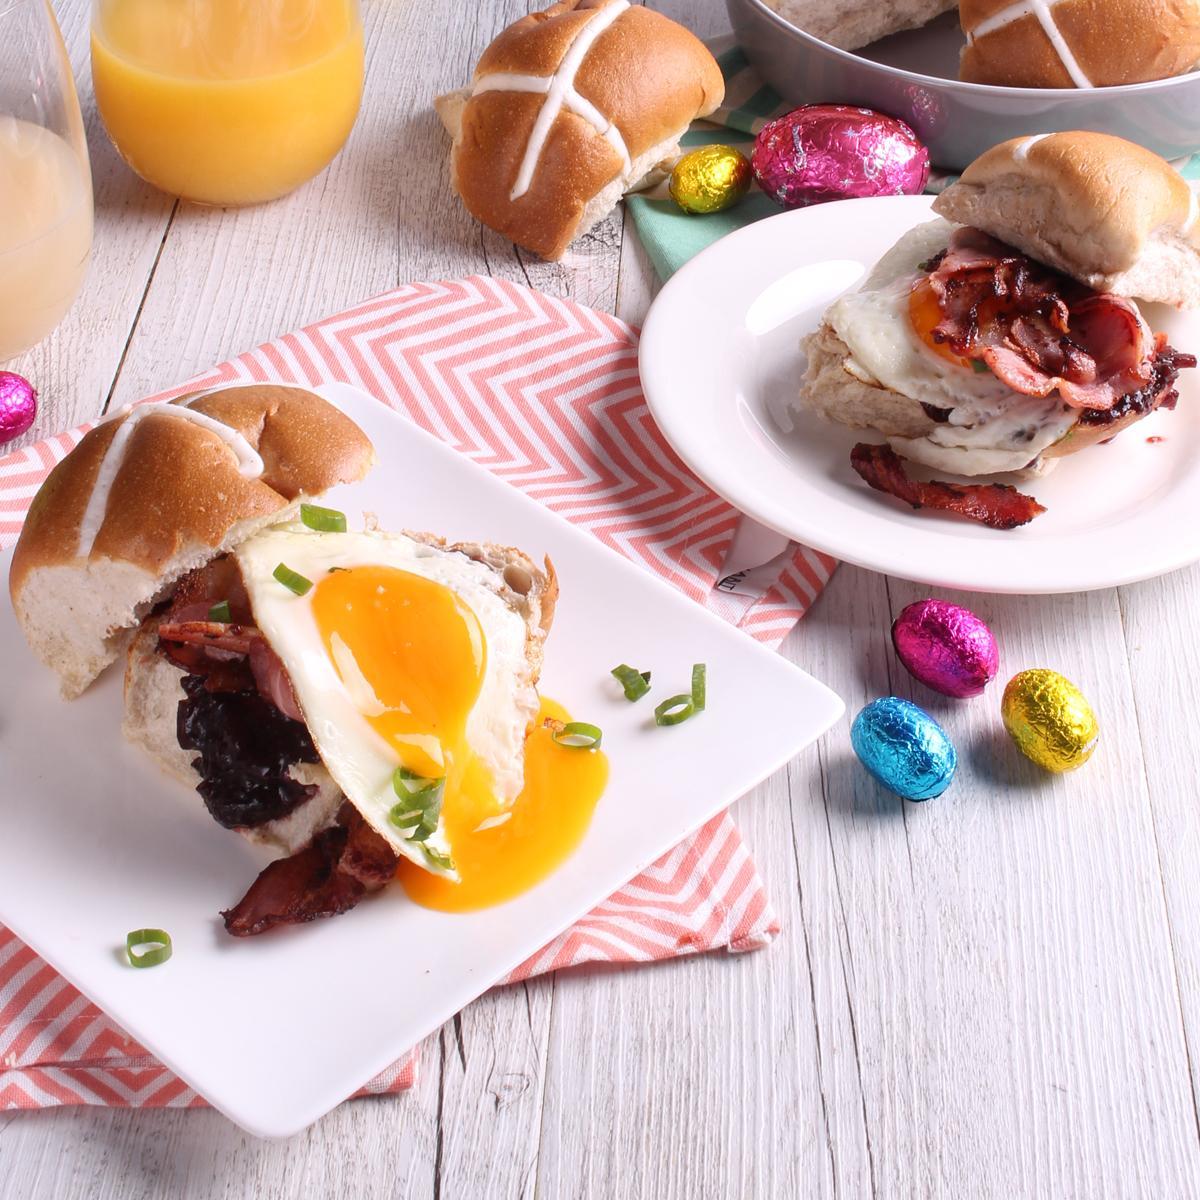 aster breakfast - ham and egg hot cross buns